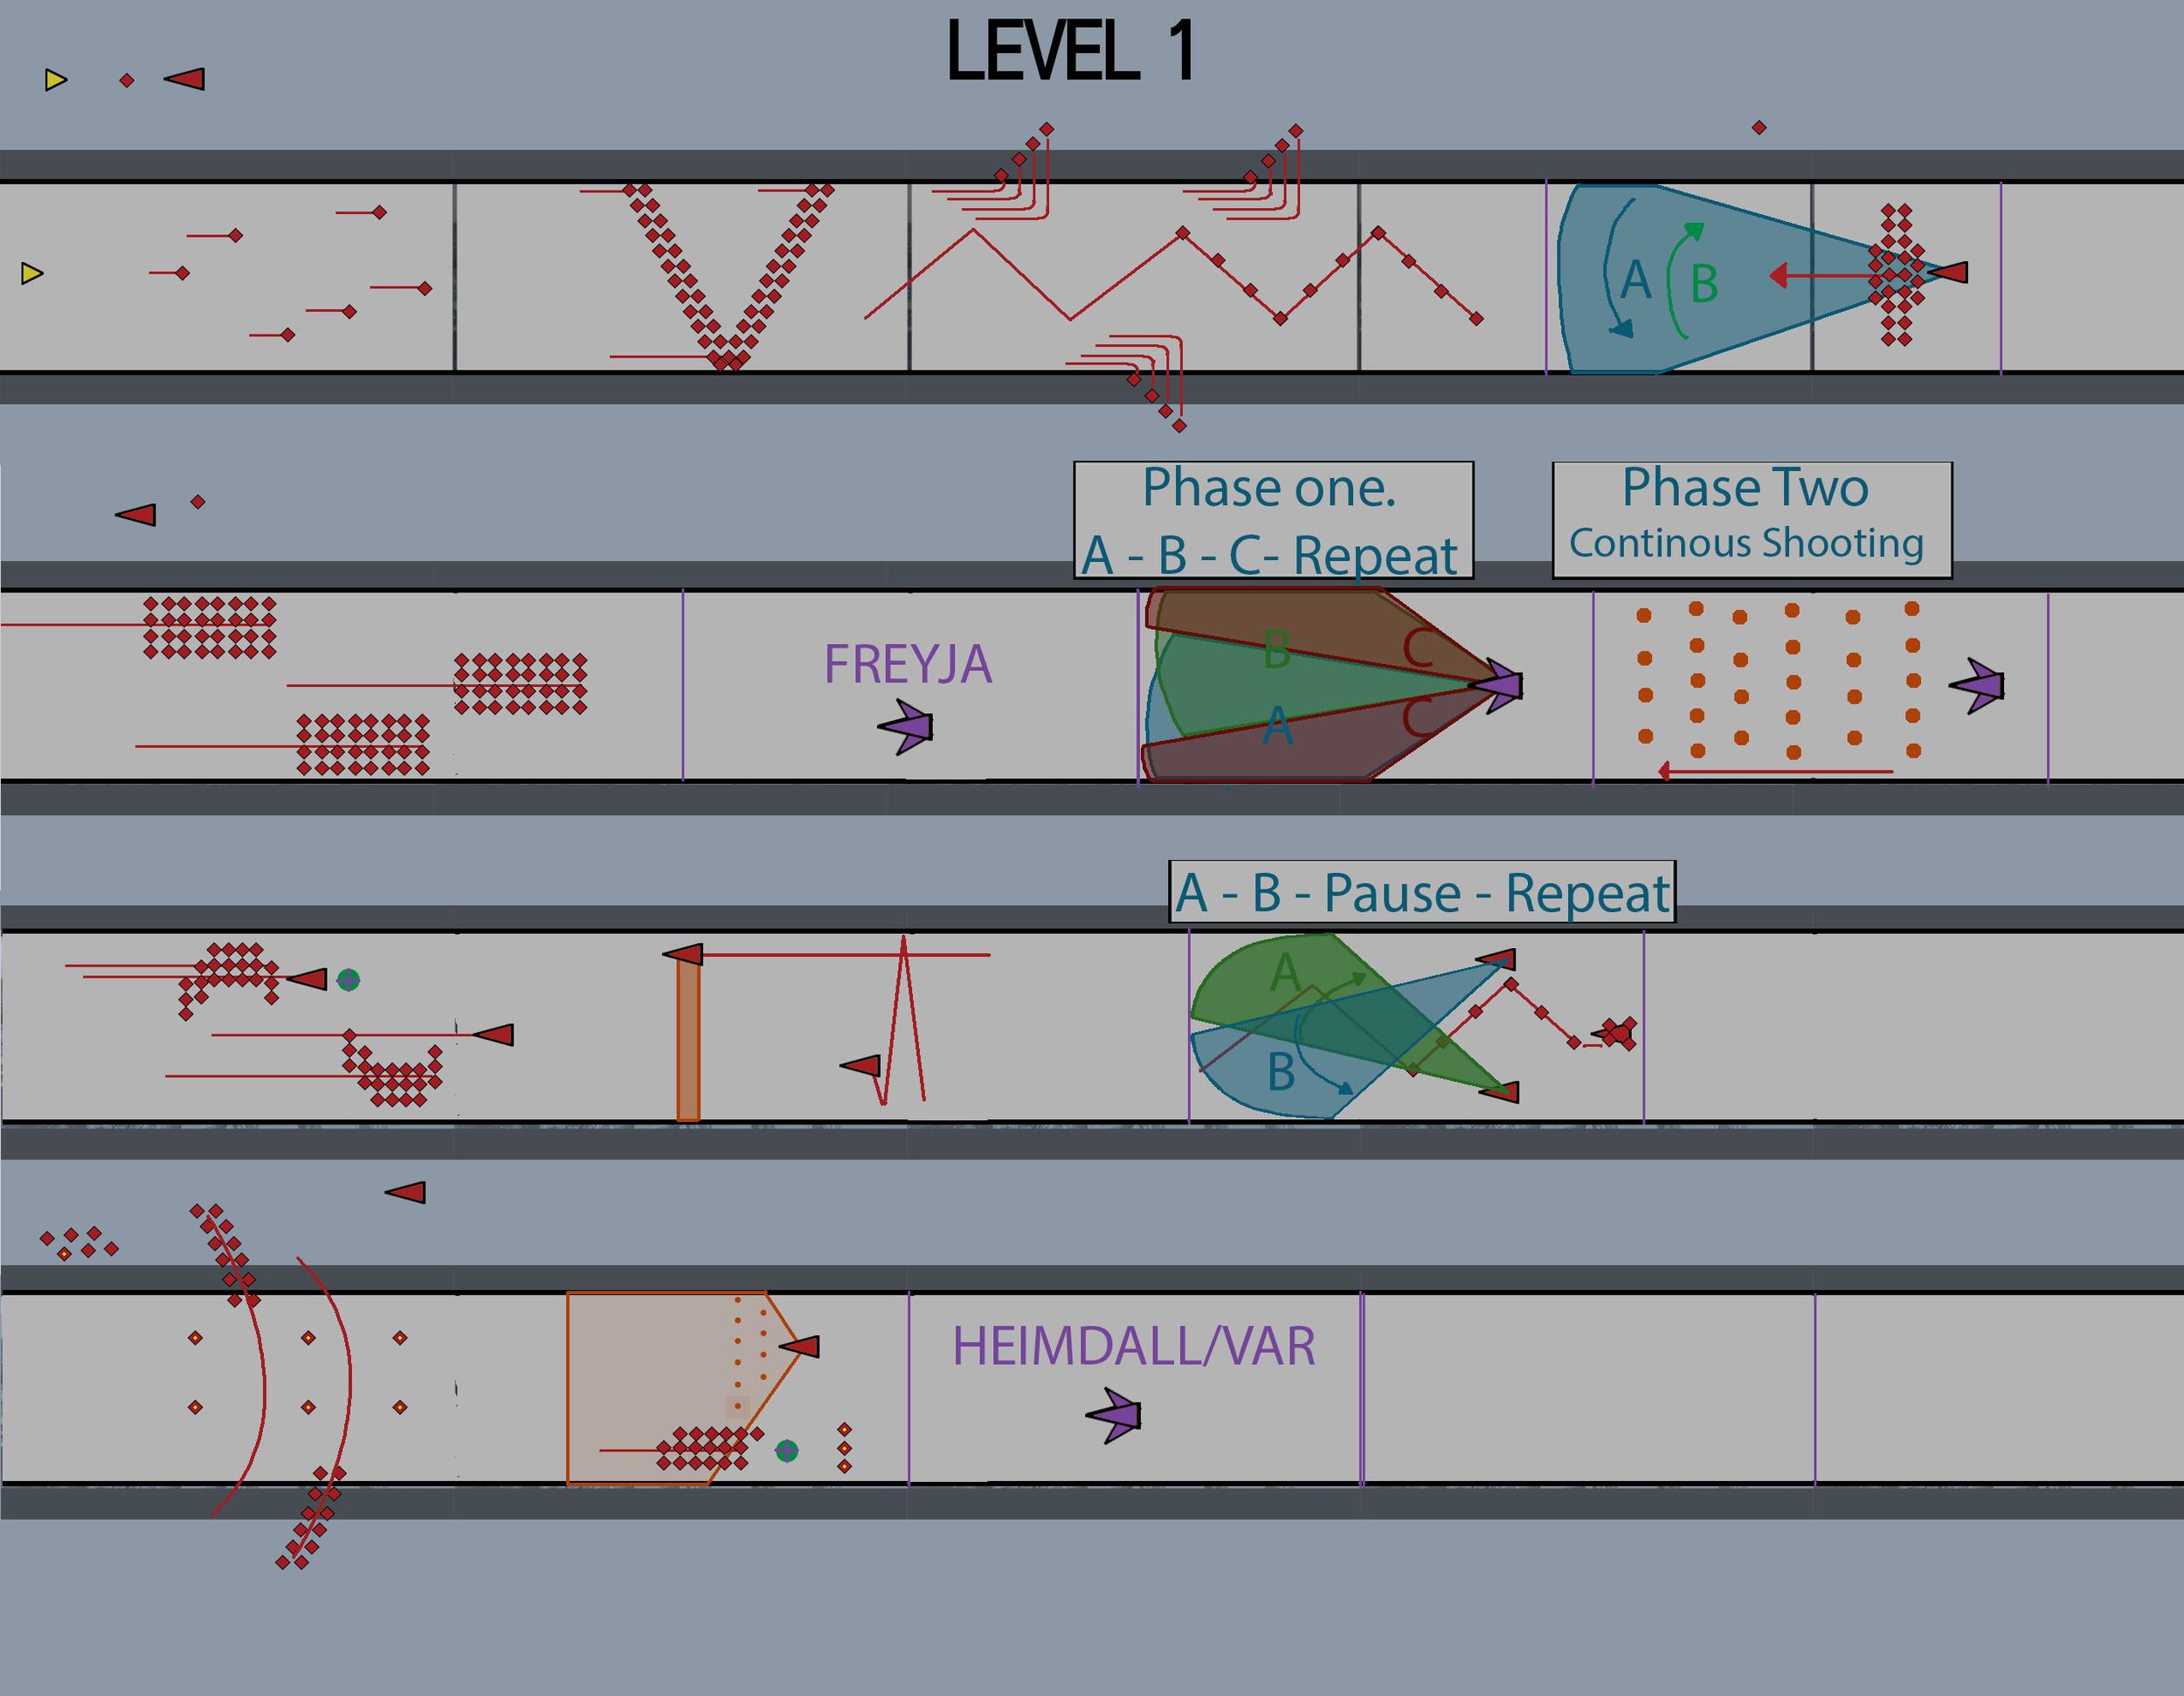 Level Design pre-prod for level 1